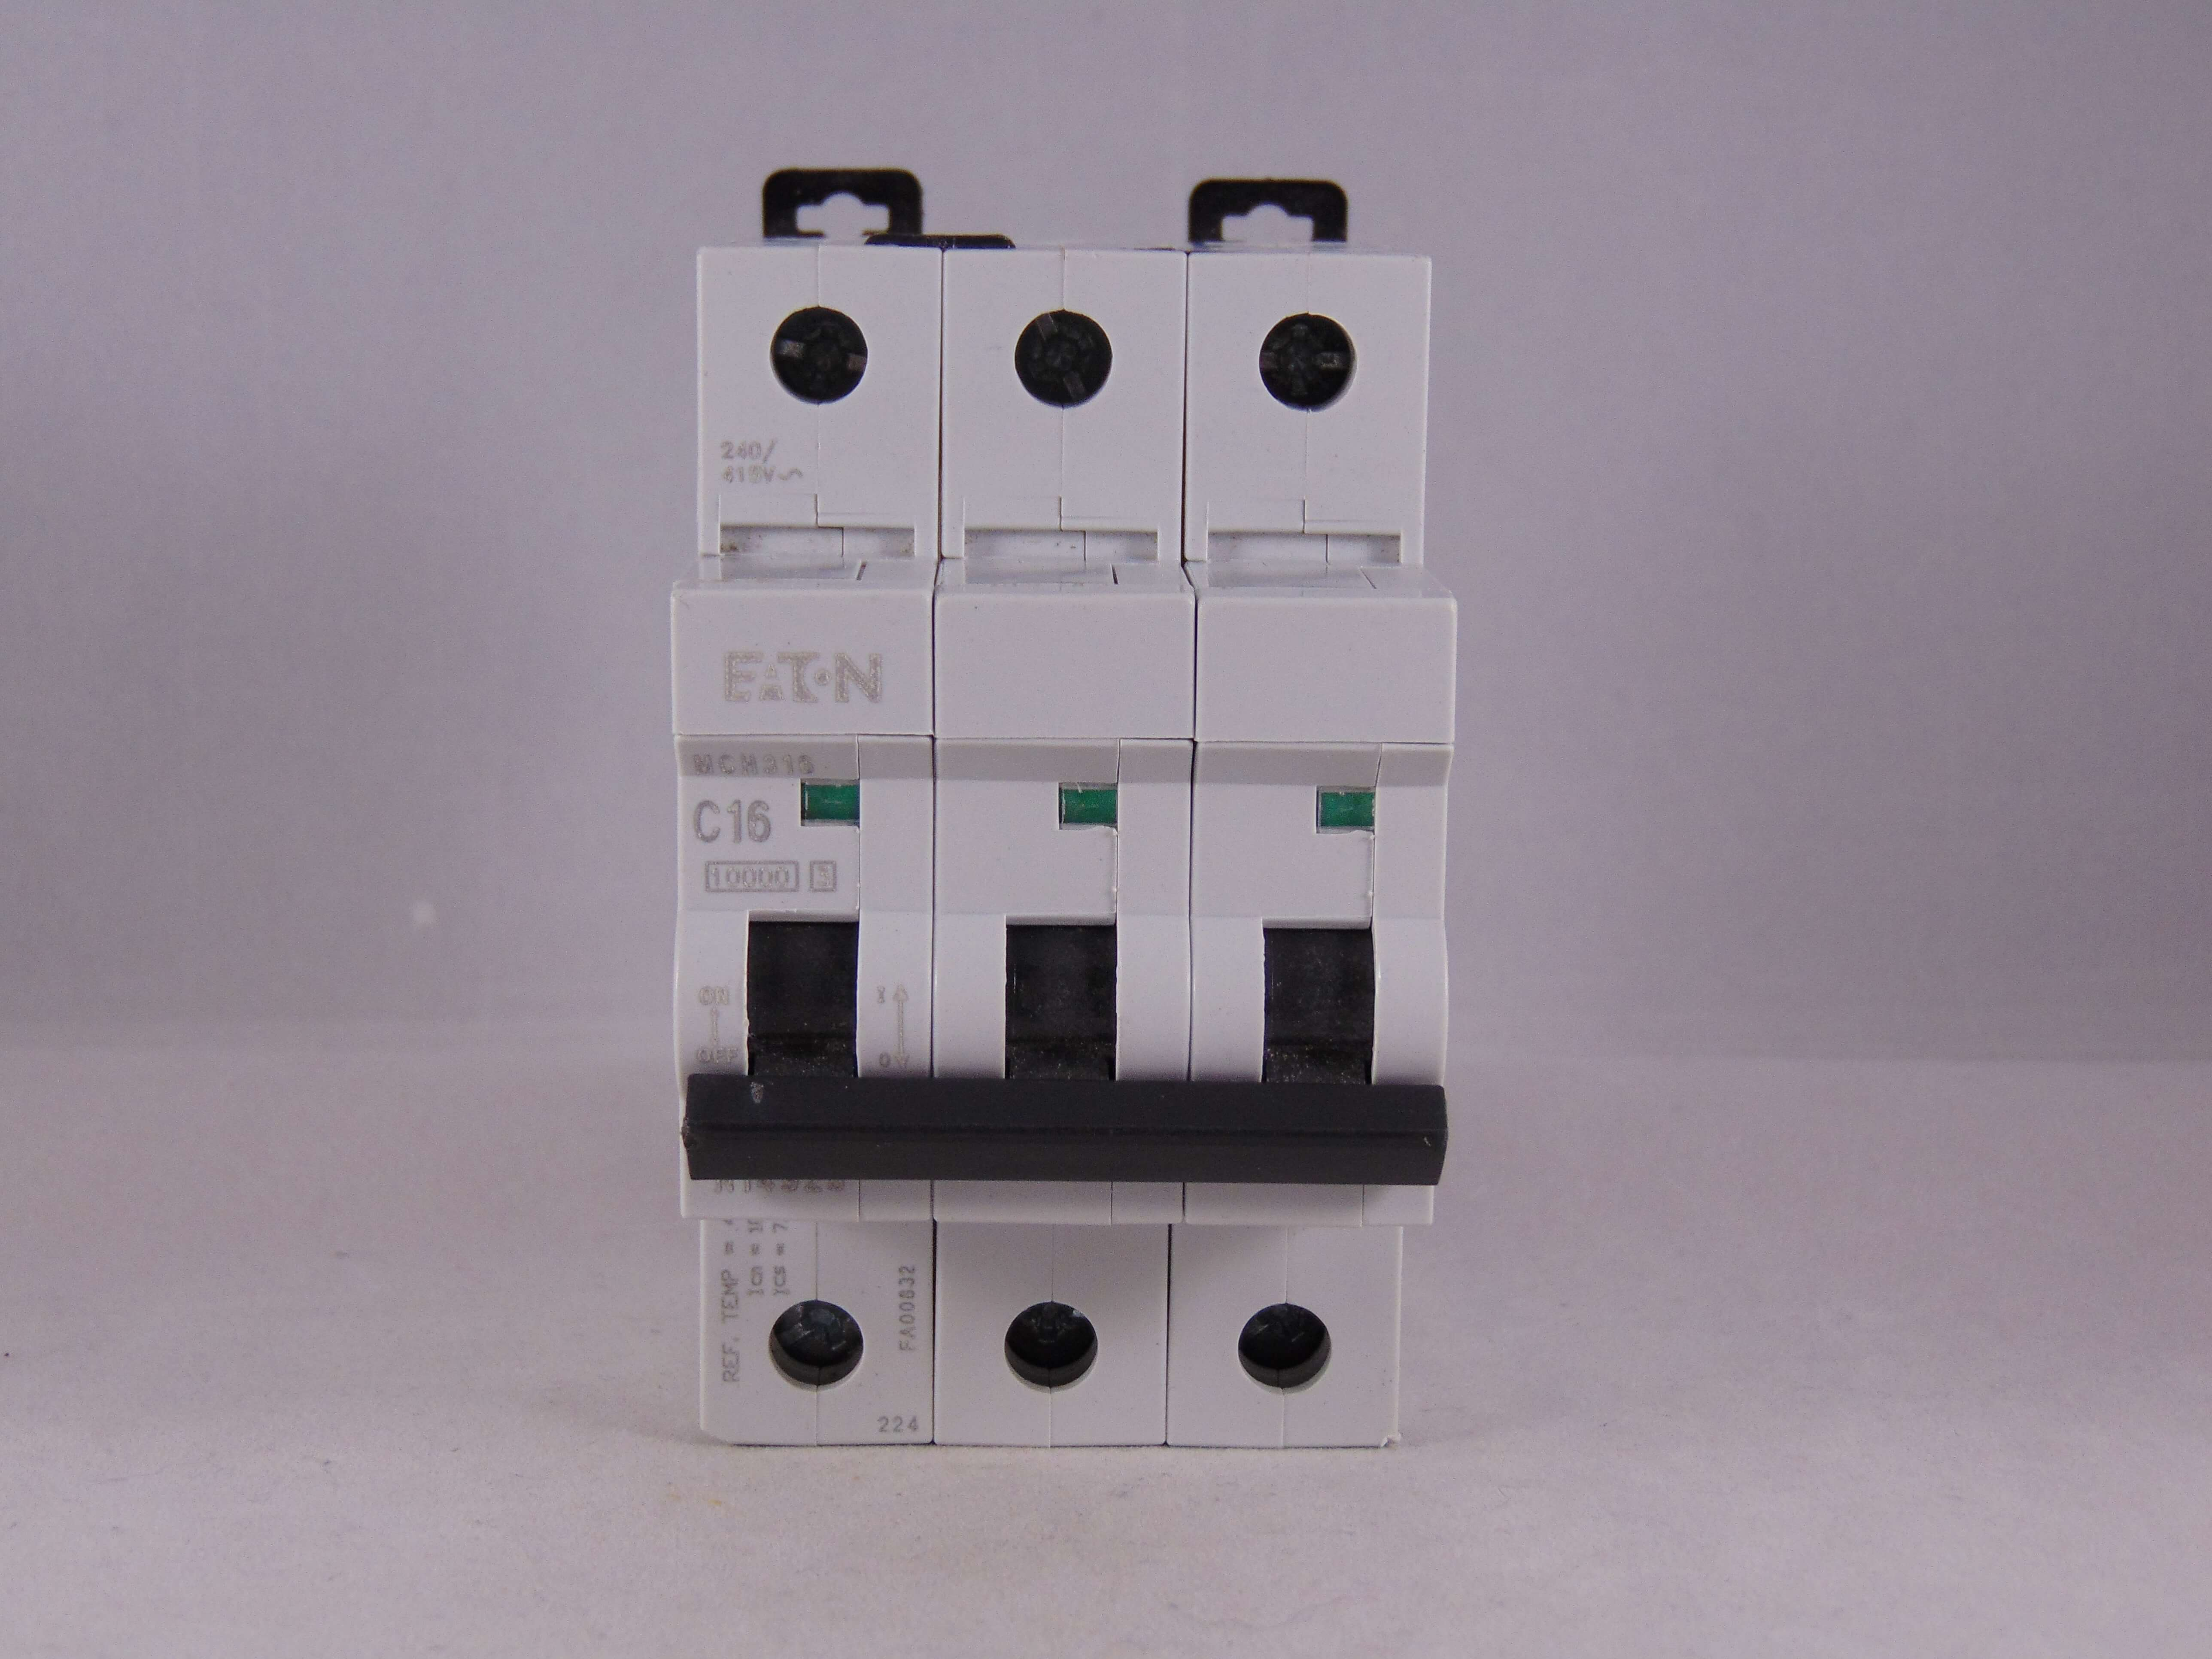 Mem Mcb 16 Amp Triple Pole 3 Phase Breaker Type C 16a C16